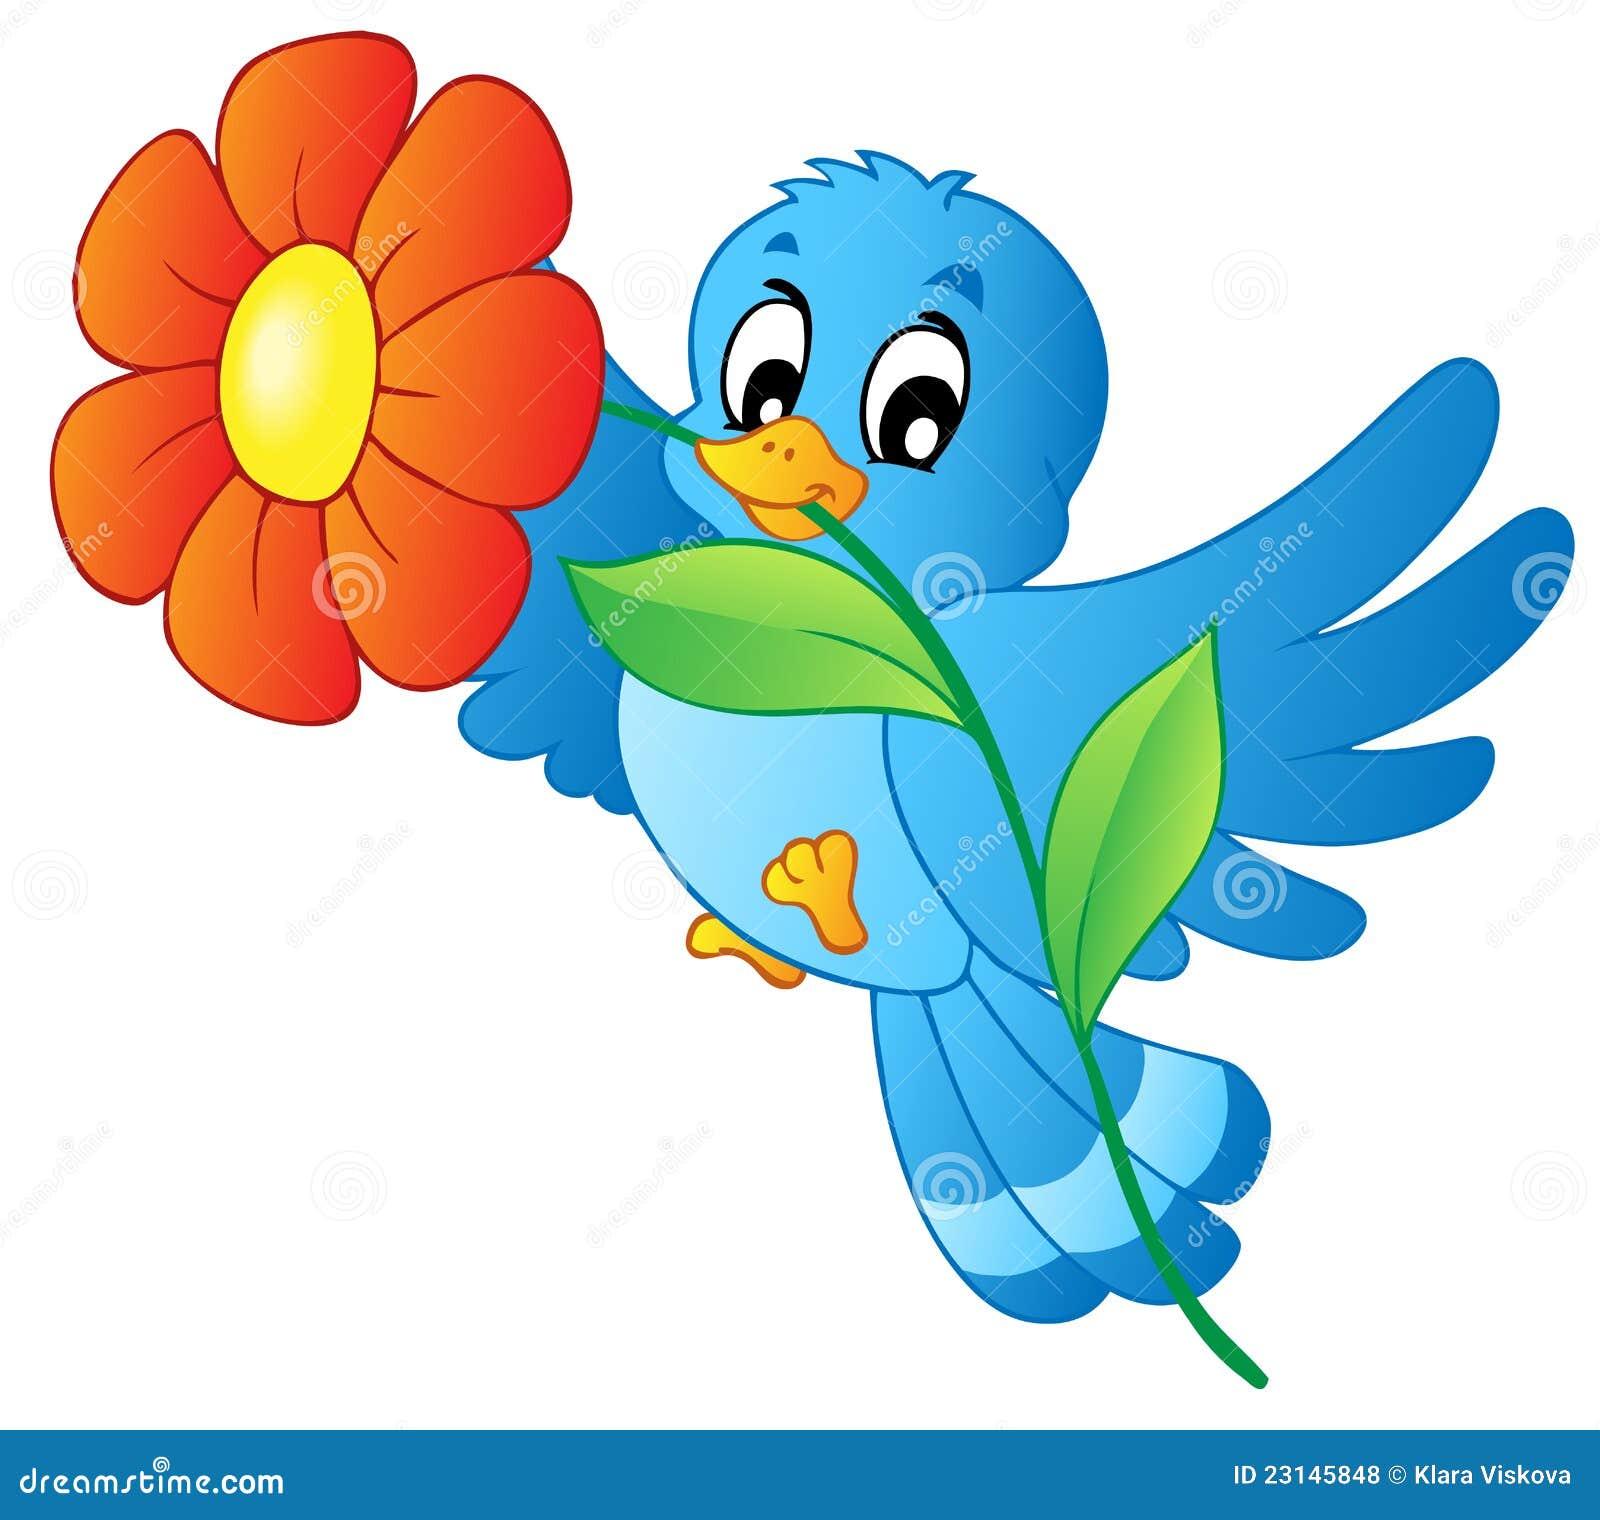 Птички картинки